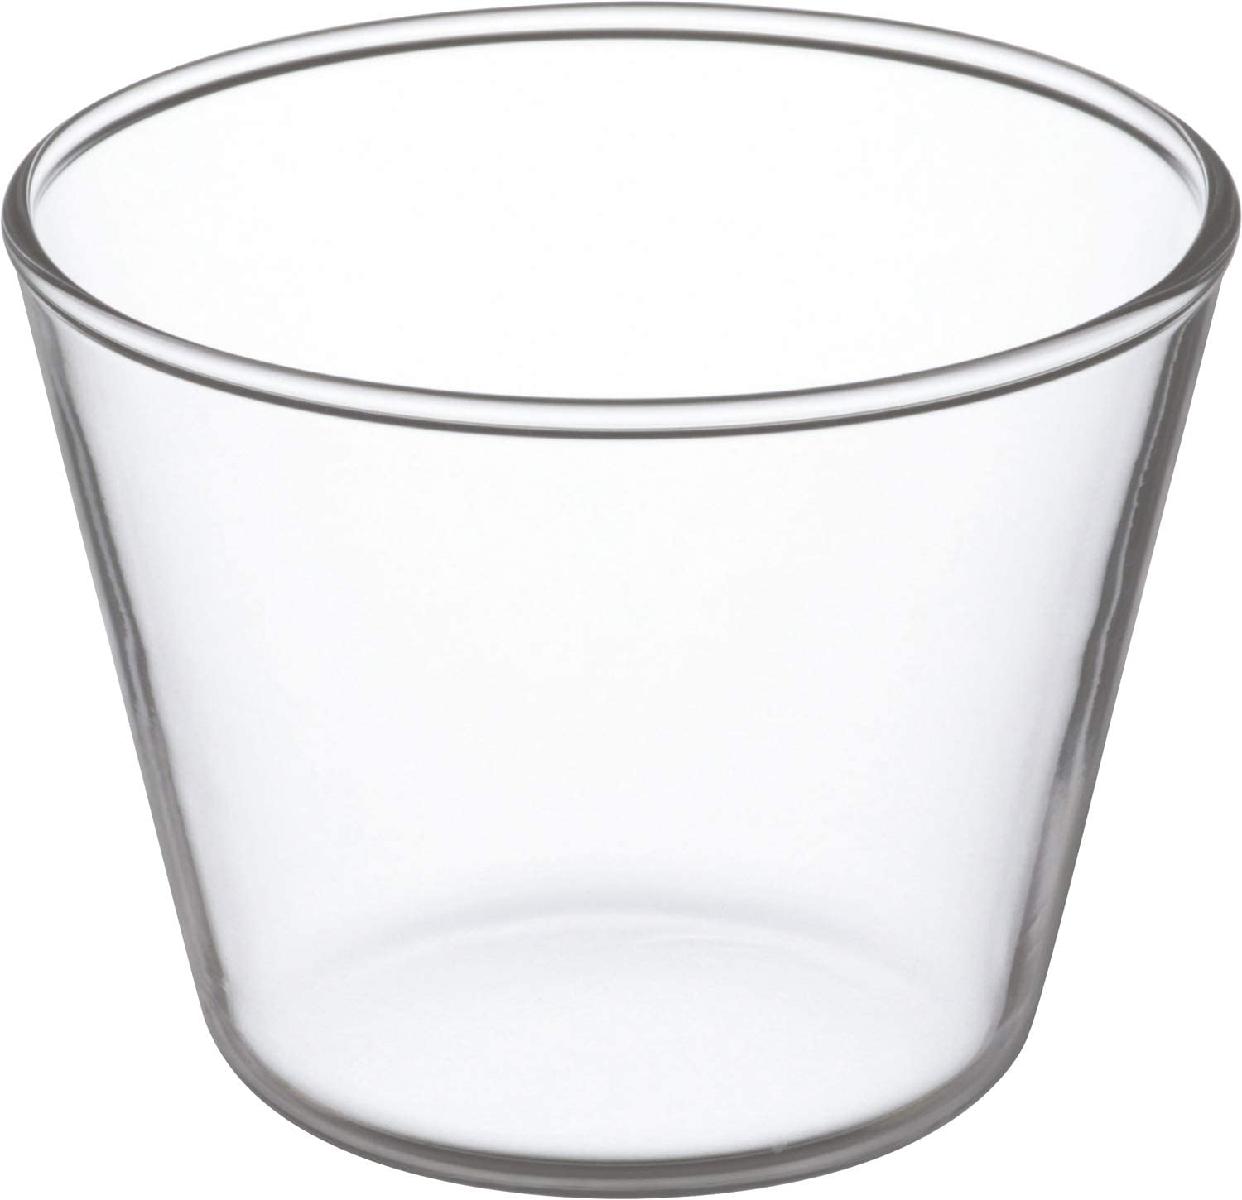 iwaki(イワキ)プリンカップ KBT904 150mlの商品画像